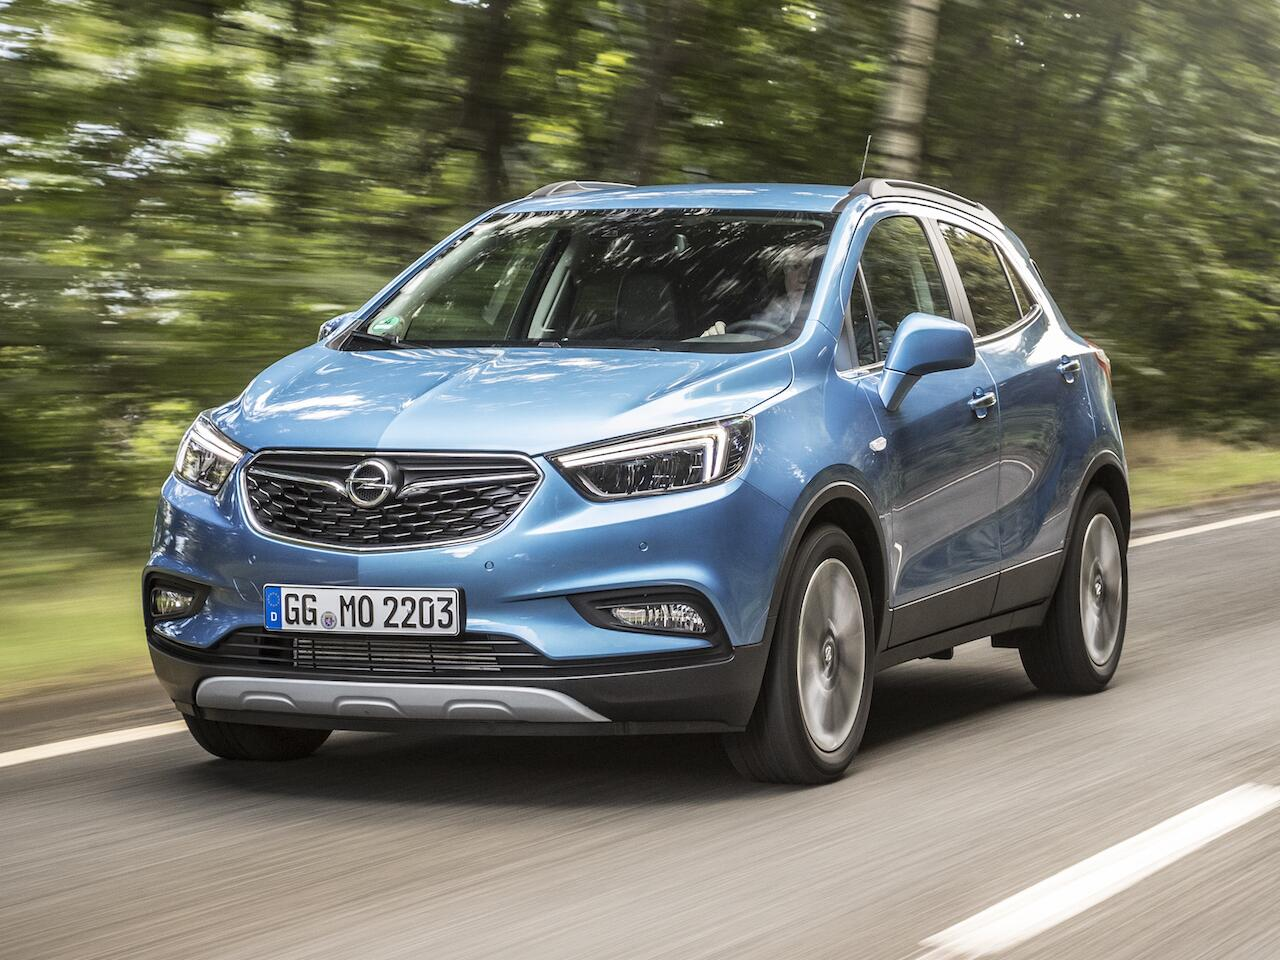 Bild zu Platz 6: Opel Mokka X